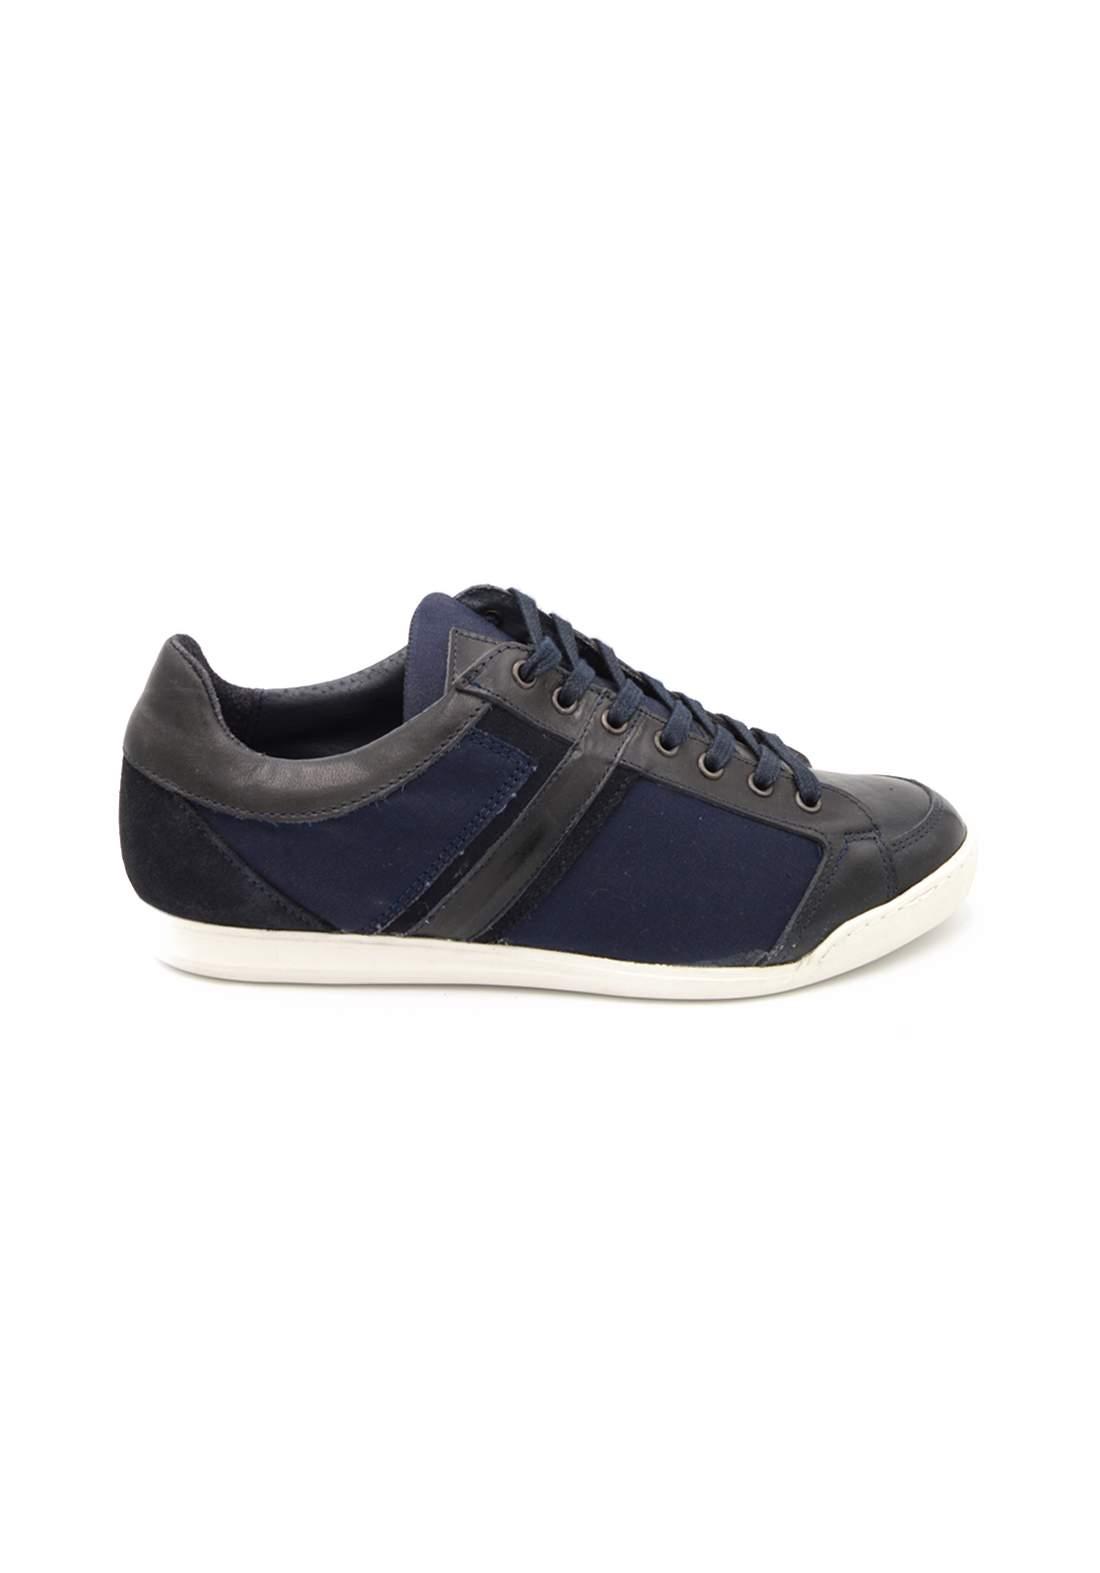 حذاء رجالي نيلي اللون من Oliver jacob